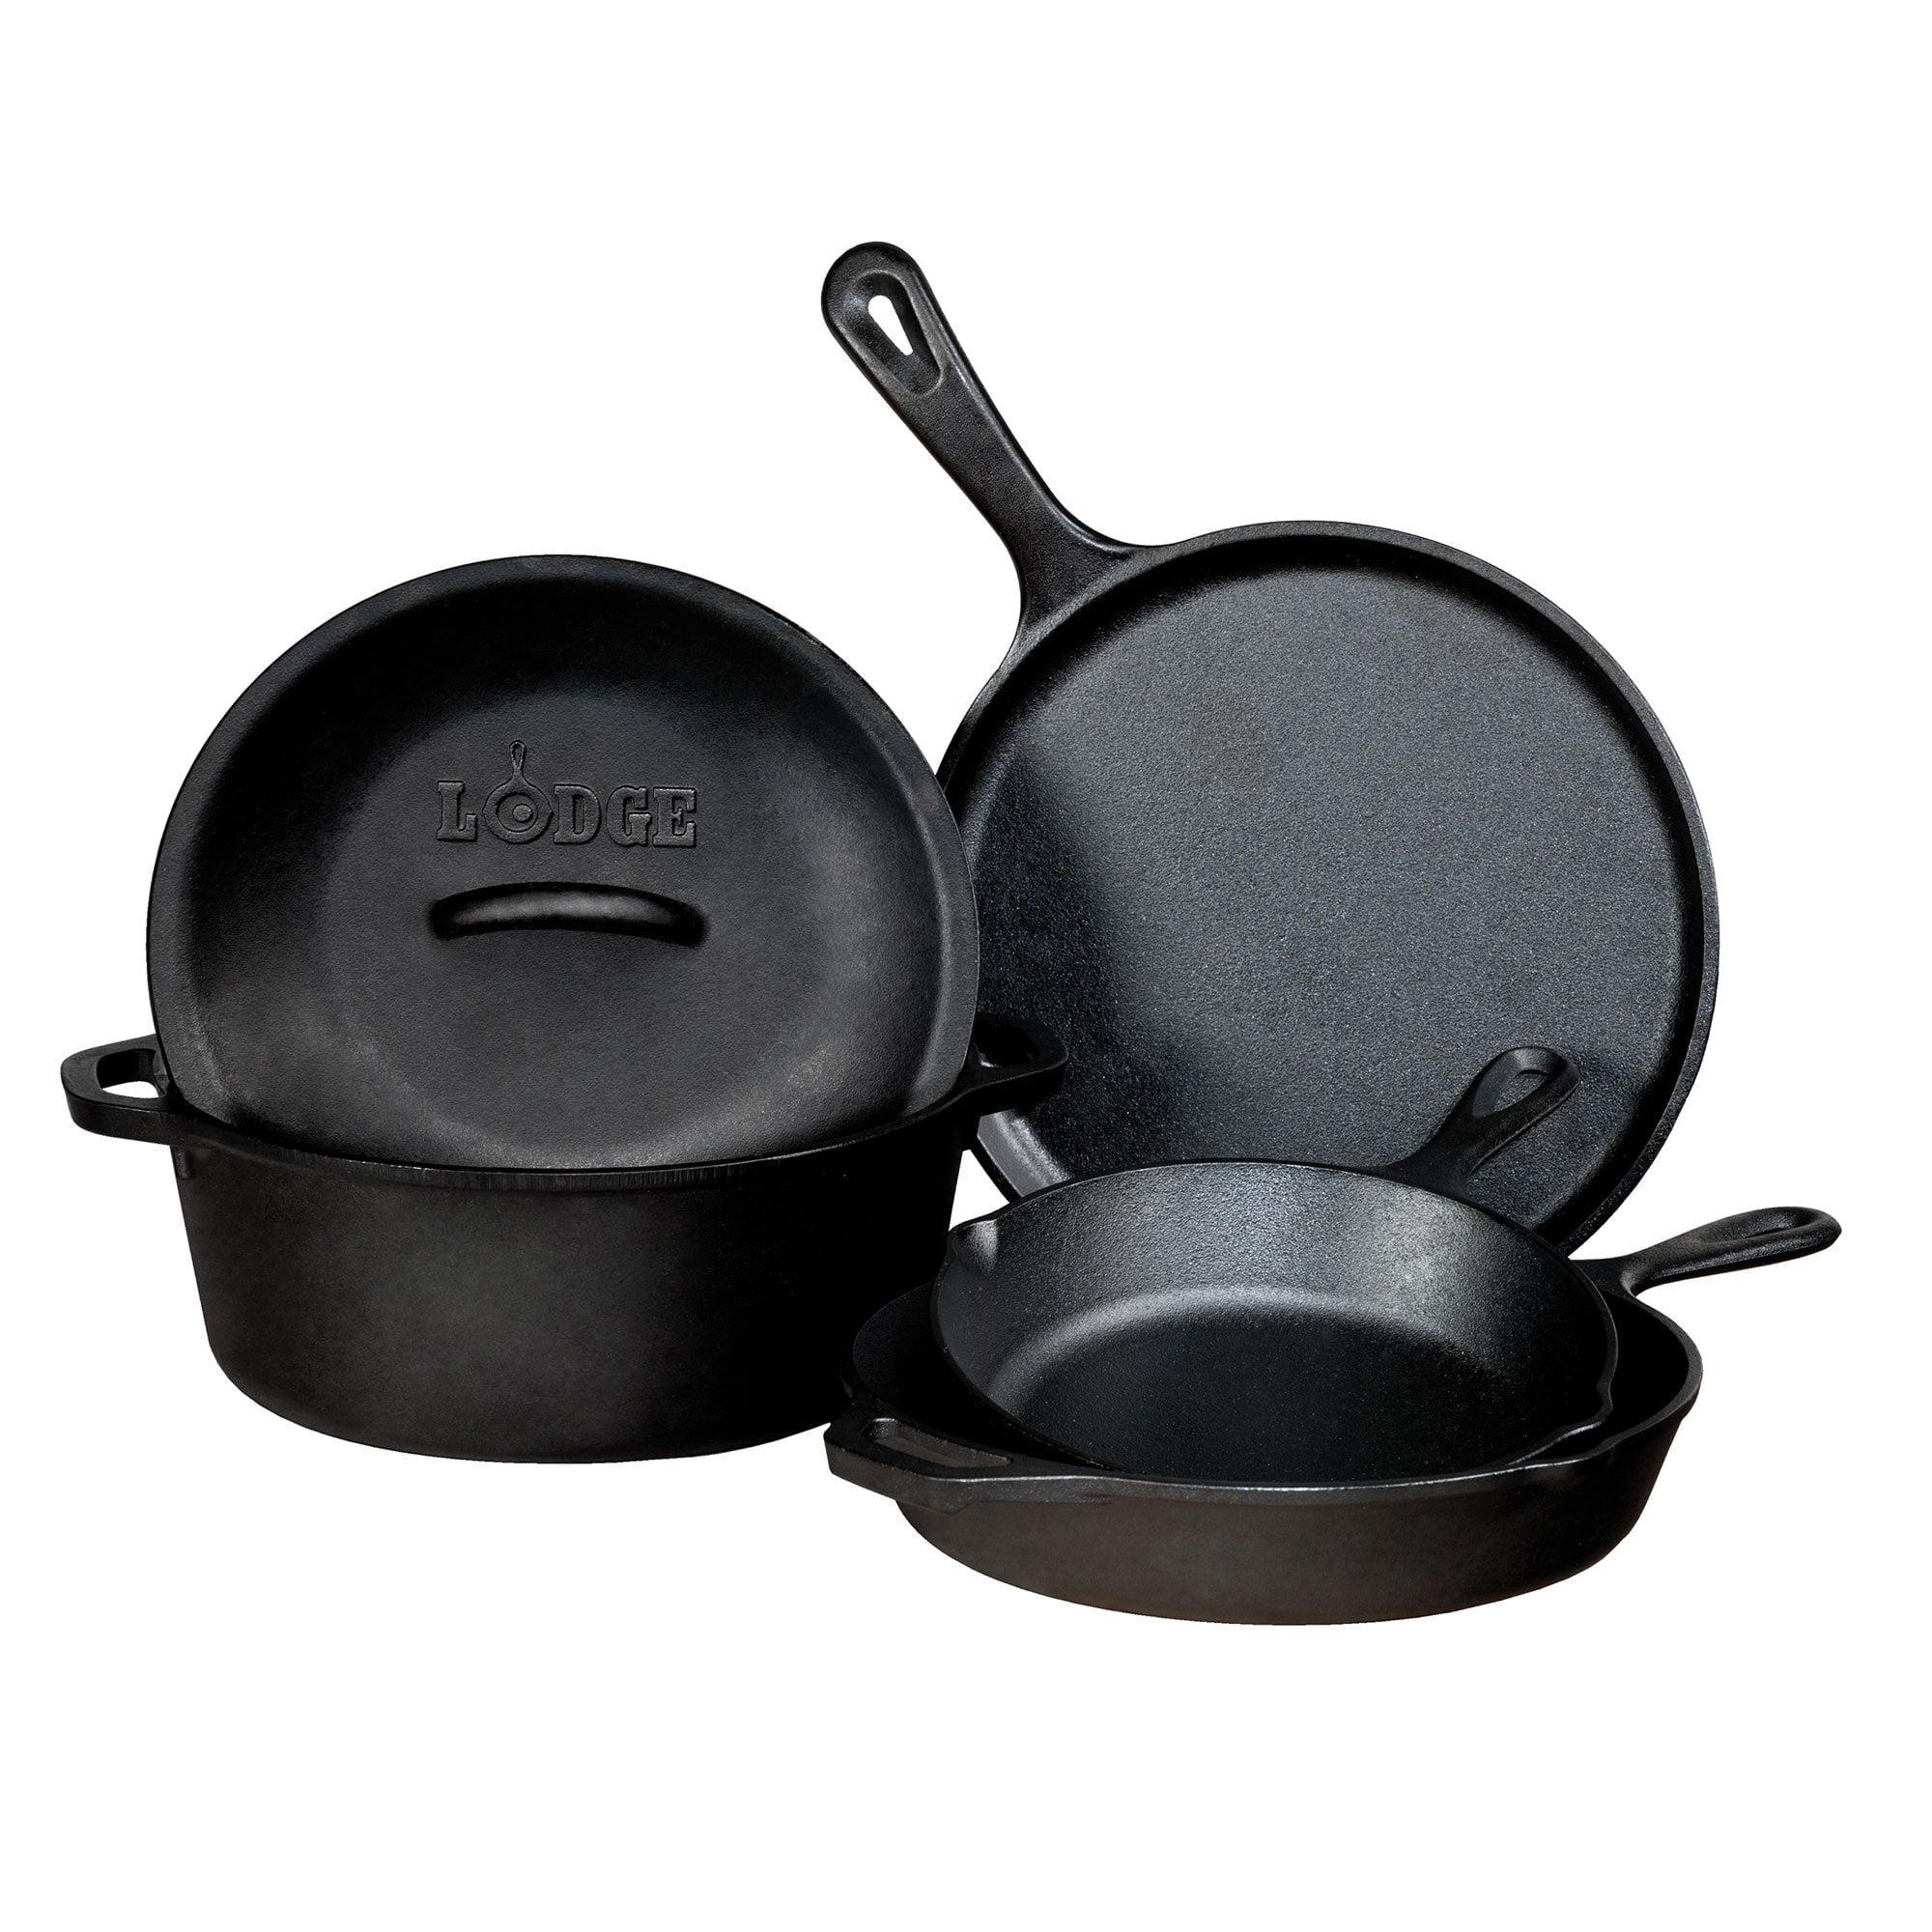 Lodge Seasoned Cast Iron 5 Piece Cookware Set w/ Skillet, Griddle, & Dutch Oven